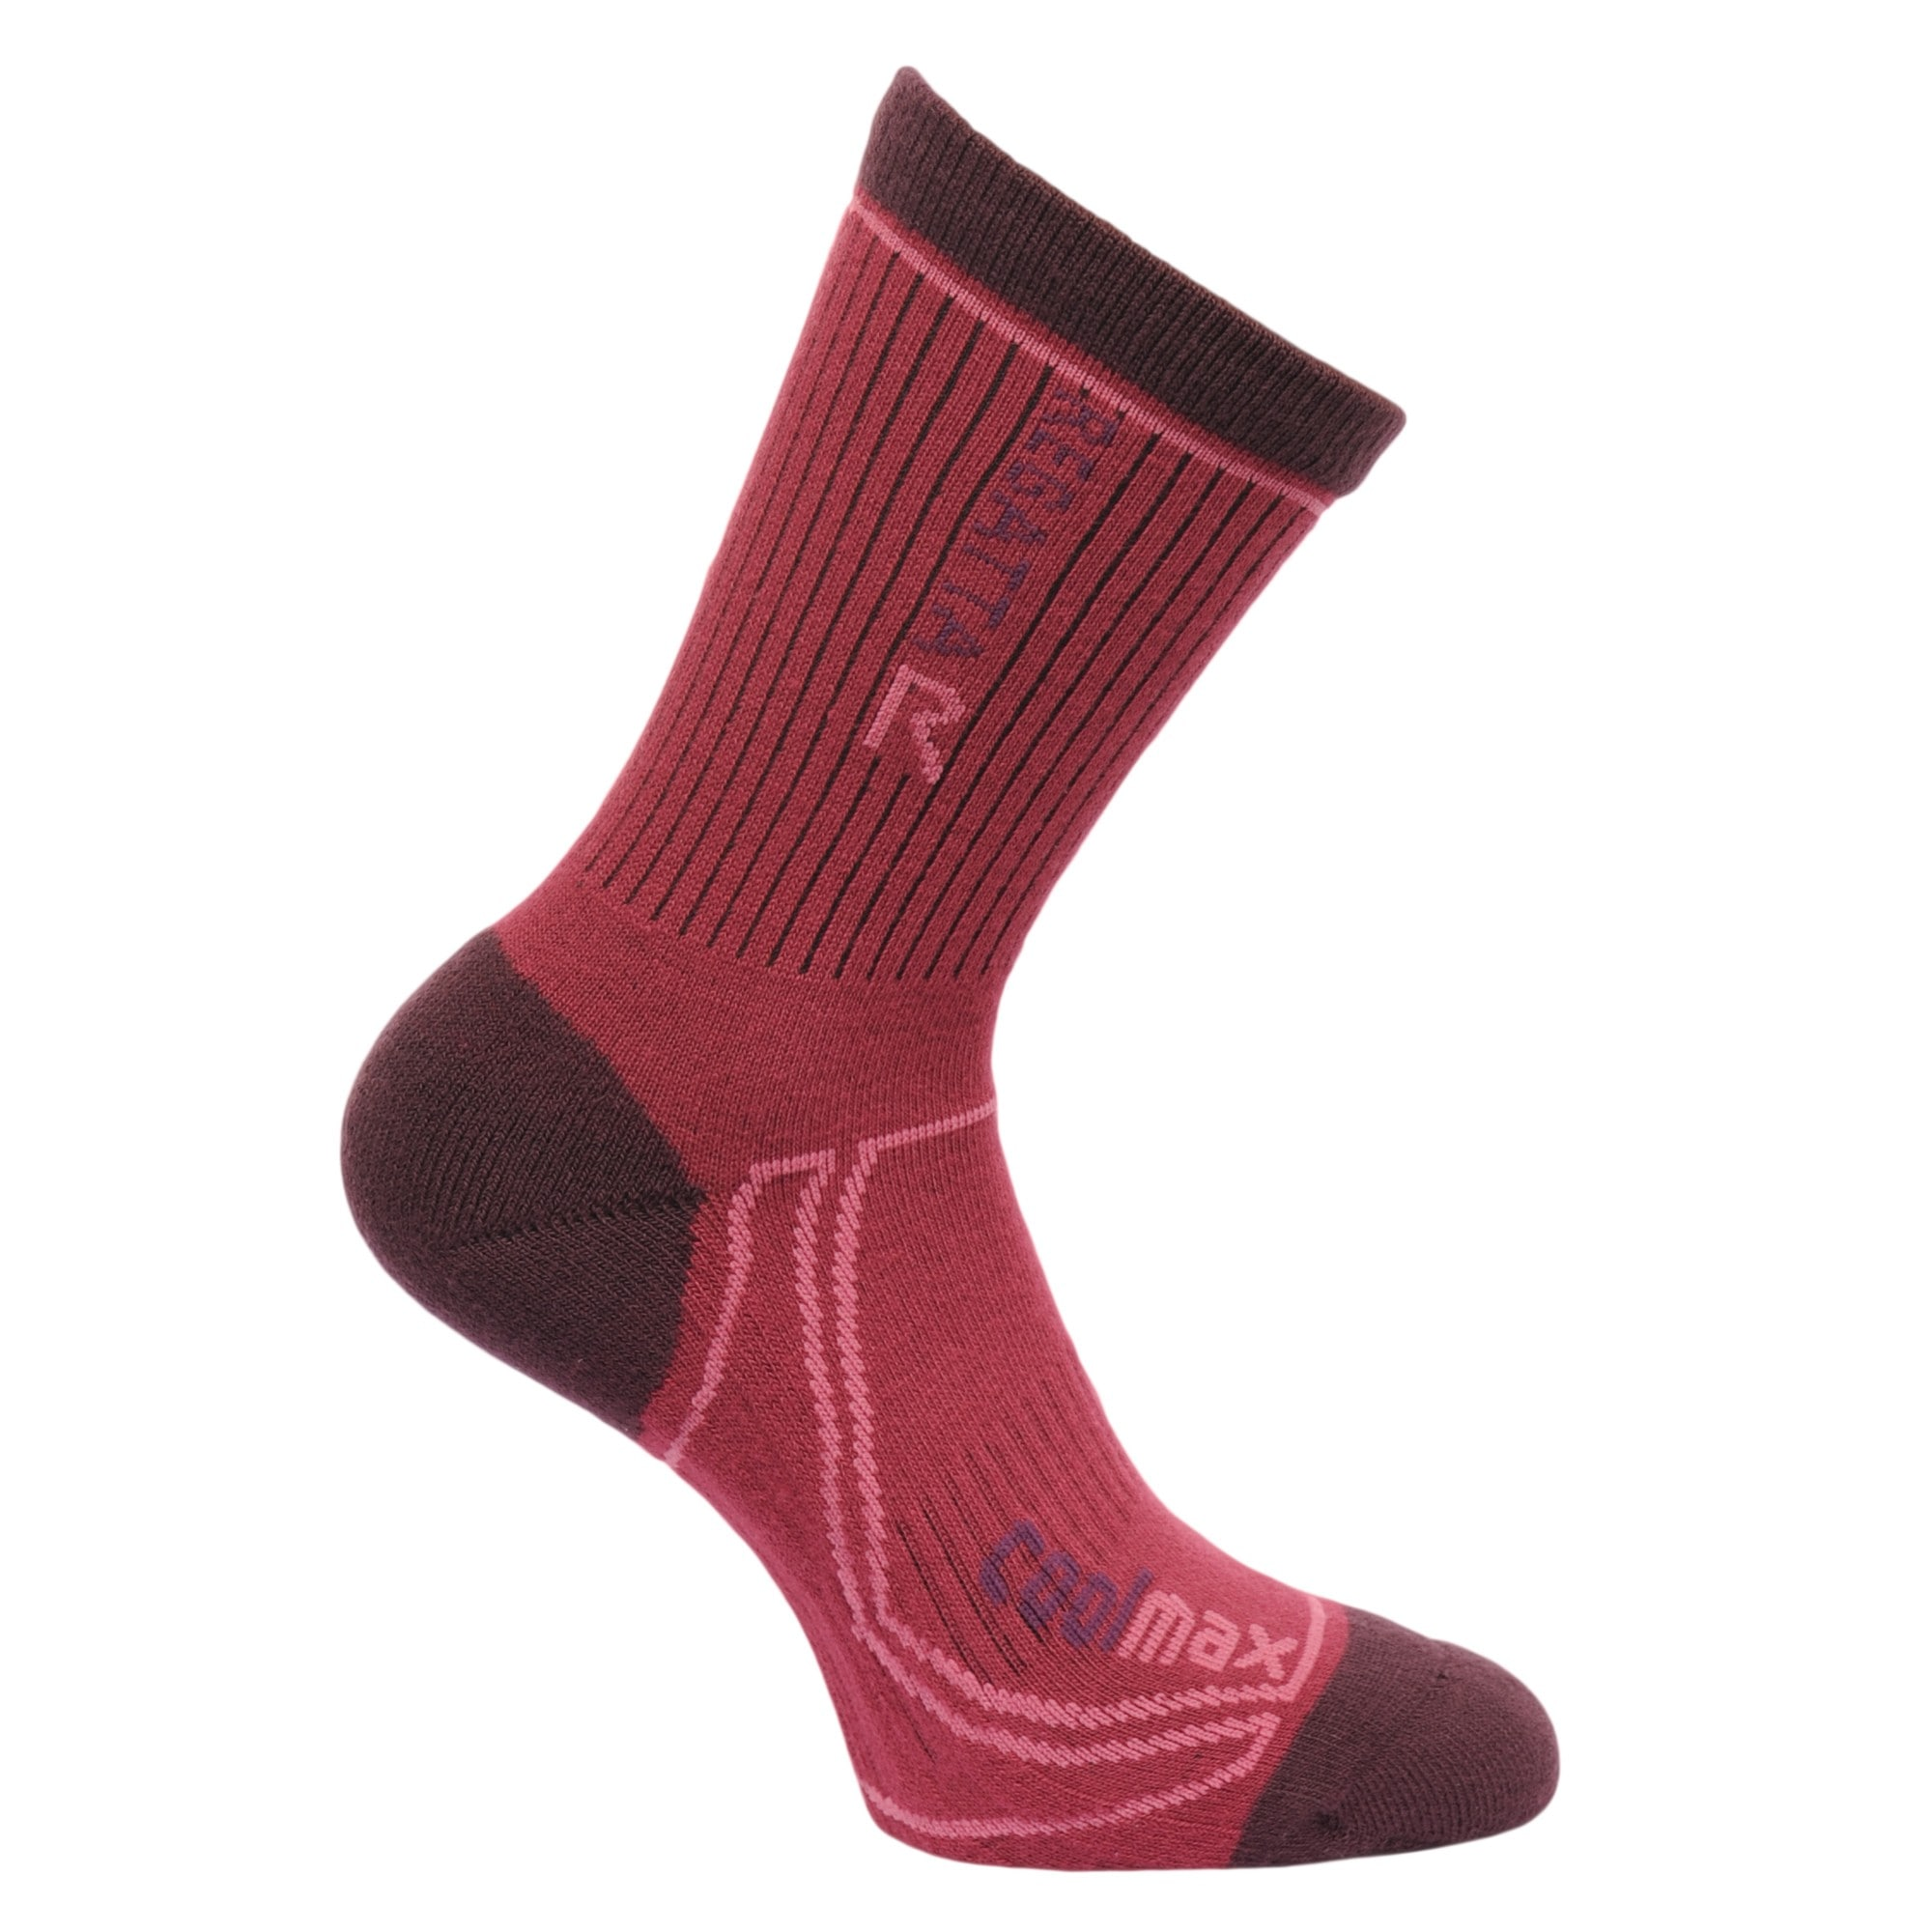 Regatta Wandersocken Great Outdoors Damen 2 Season Coolmax Socken | Sportbekleidung | Braun | Regatta